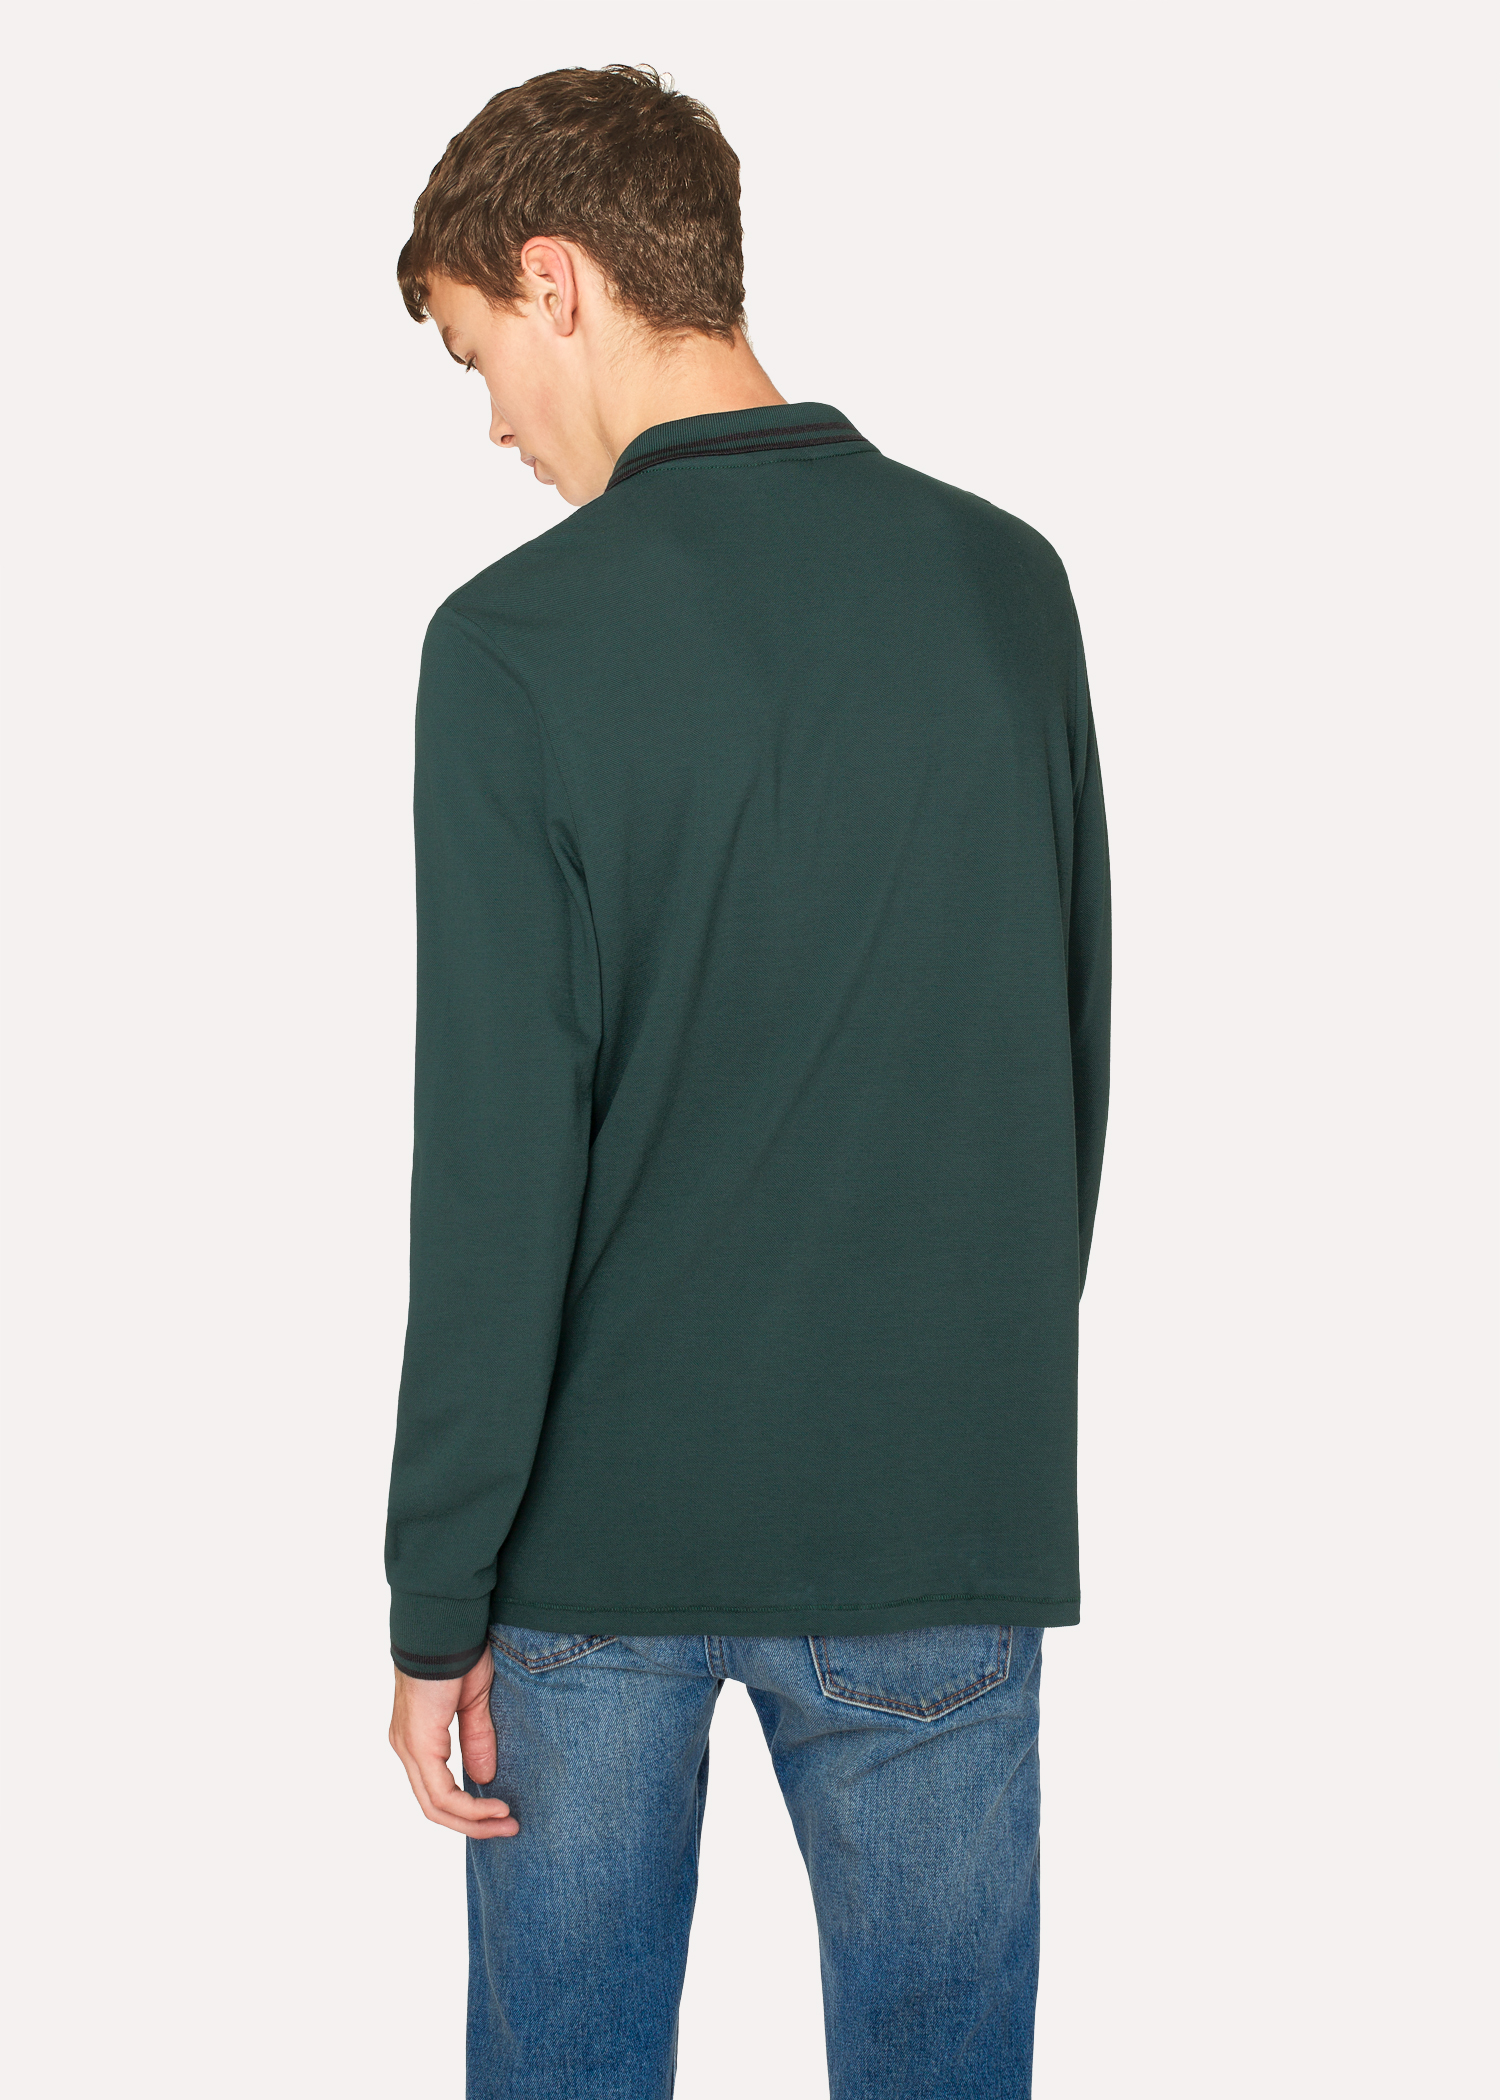 Men s Green Zebra Long-Sleeve Polo Shirt With Black Tipping - Paul ... 2ab7fbea0328